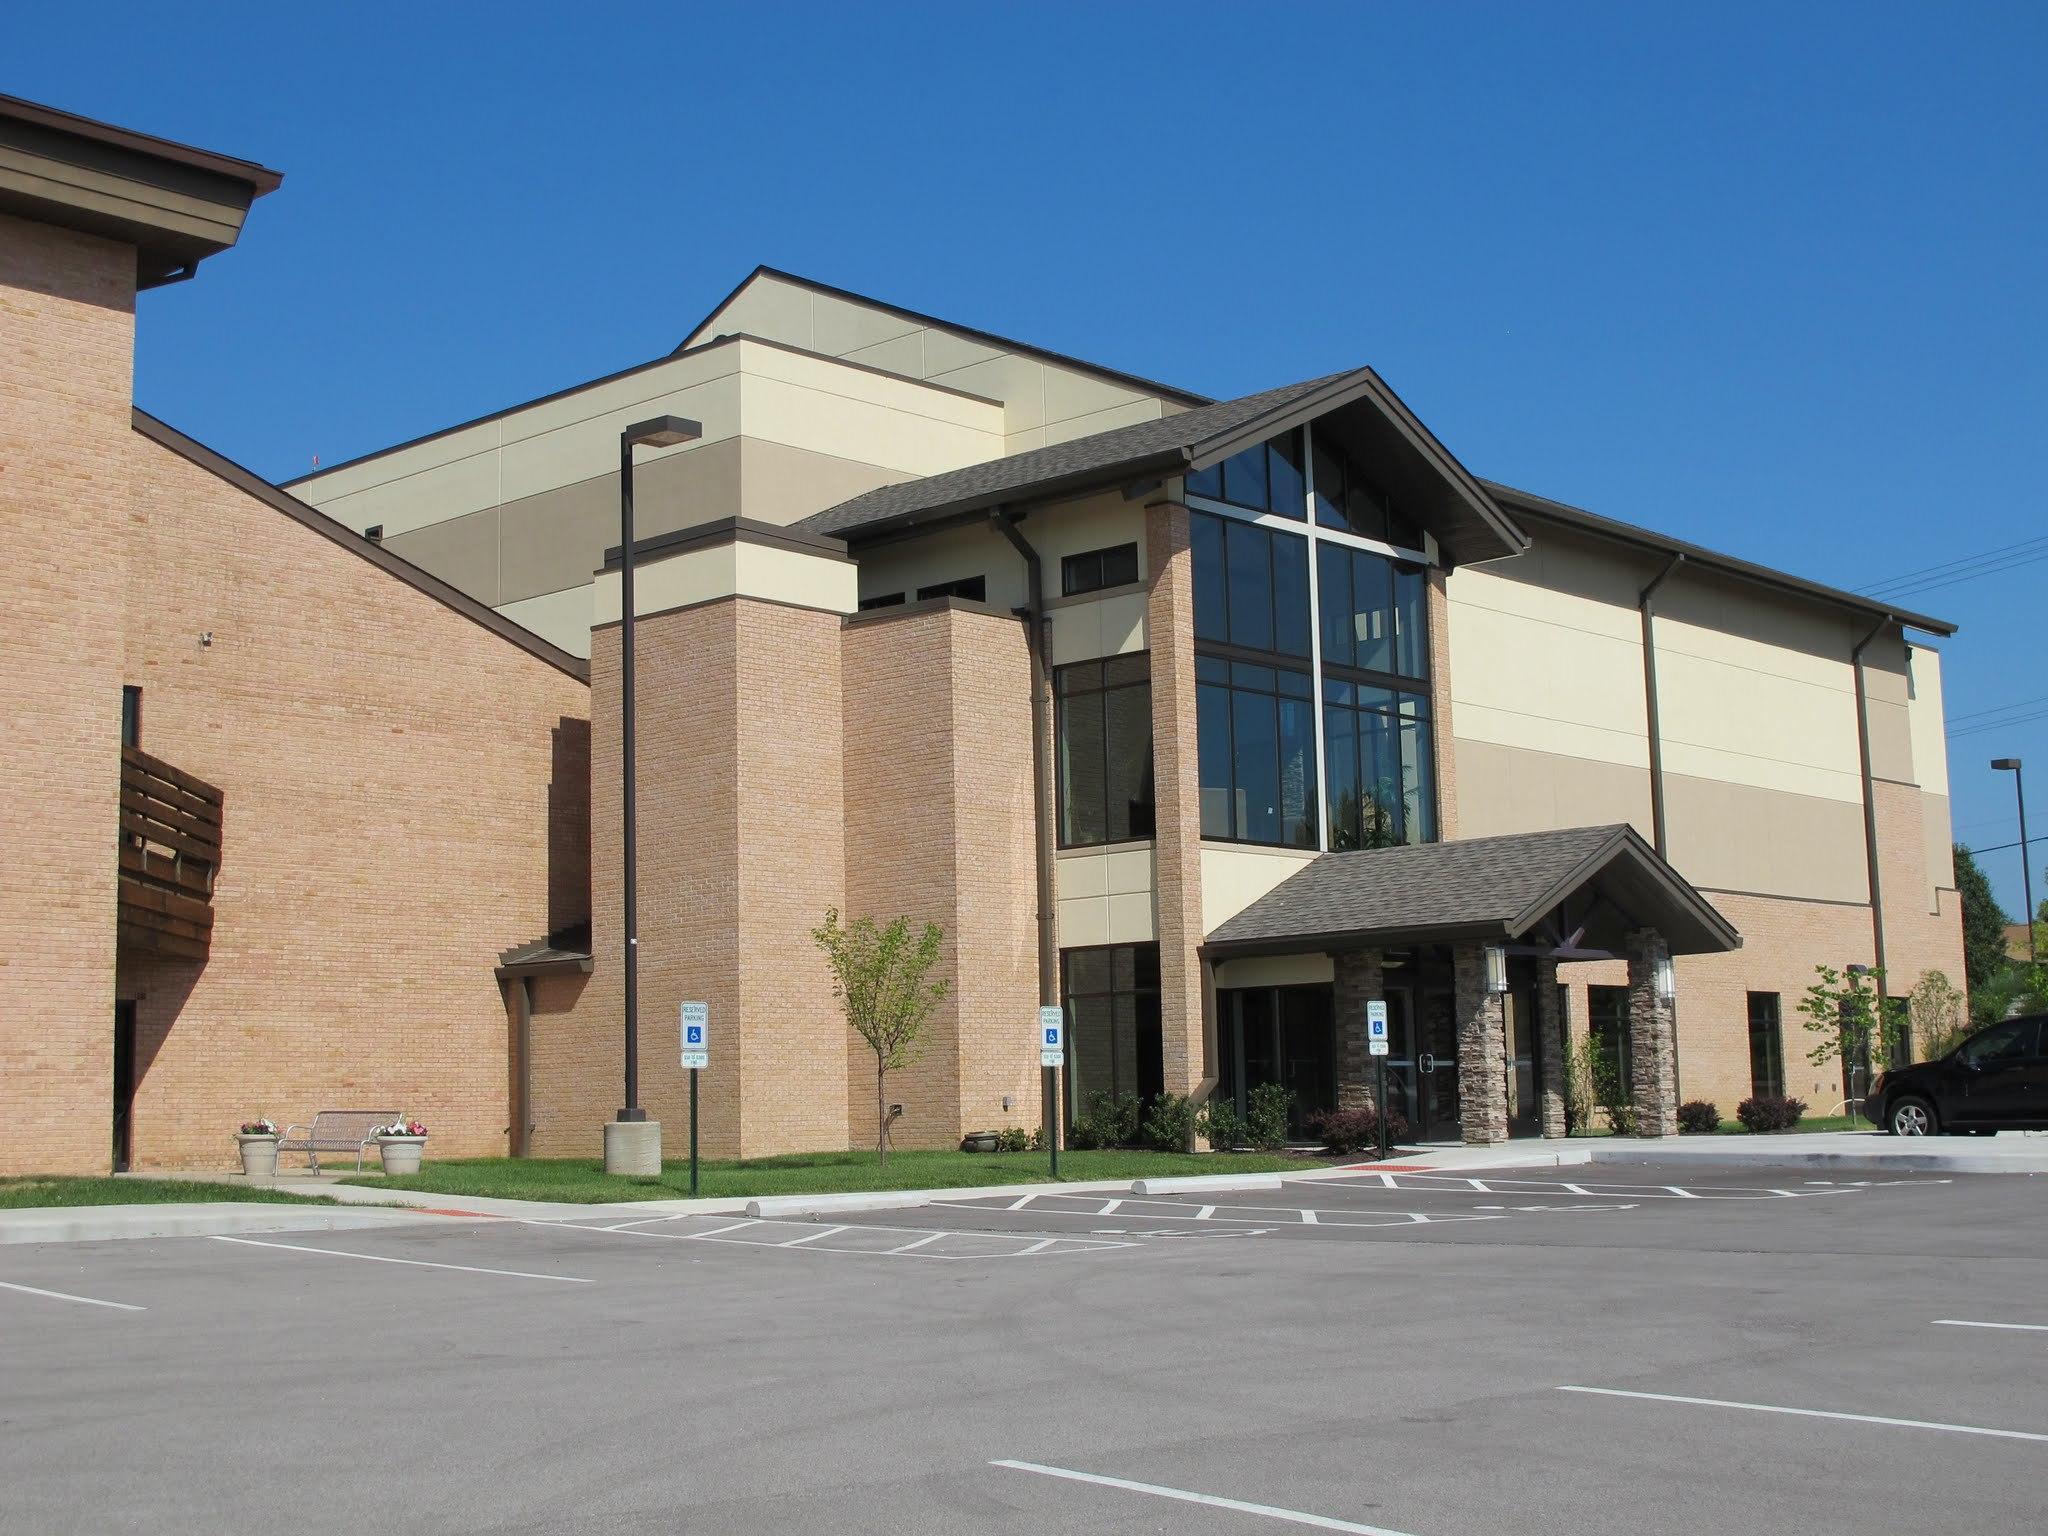 grace community chapel church childrens entrance.JPG